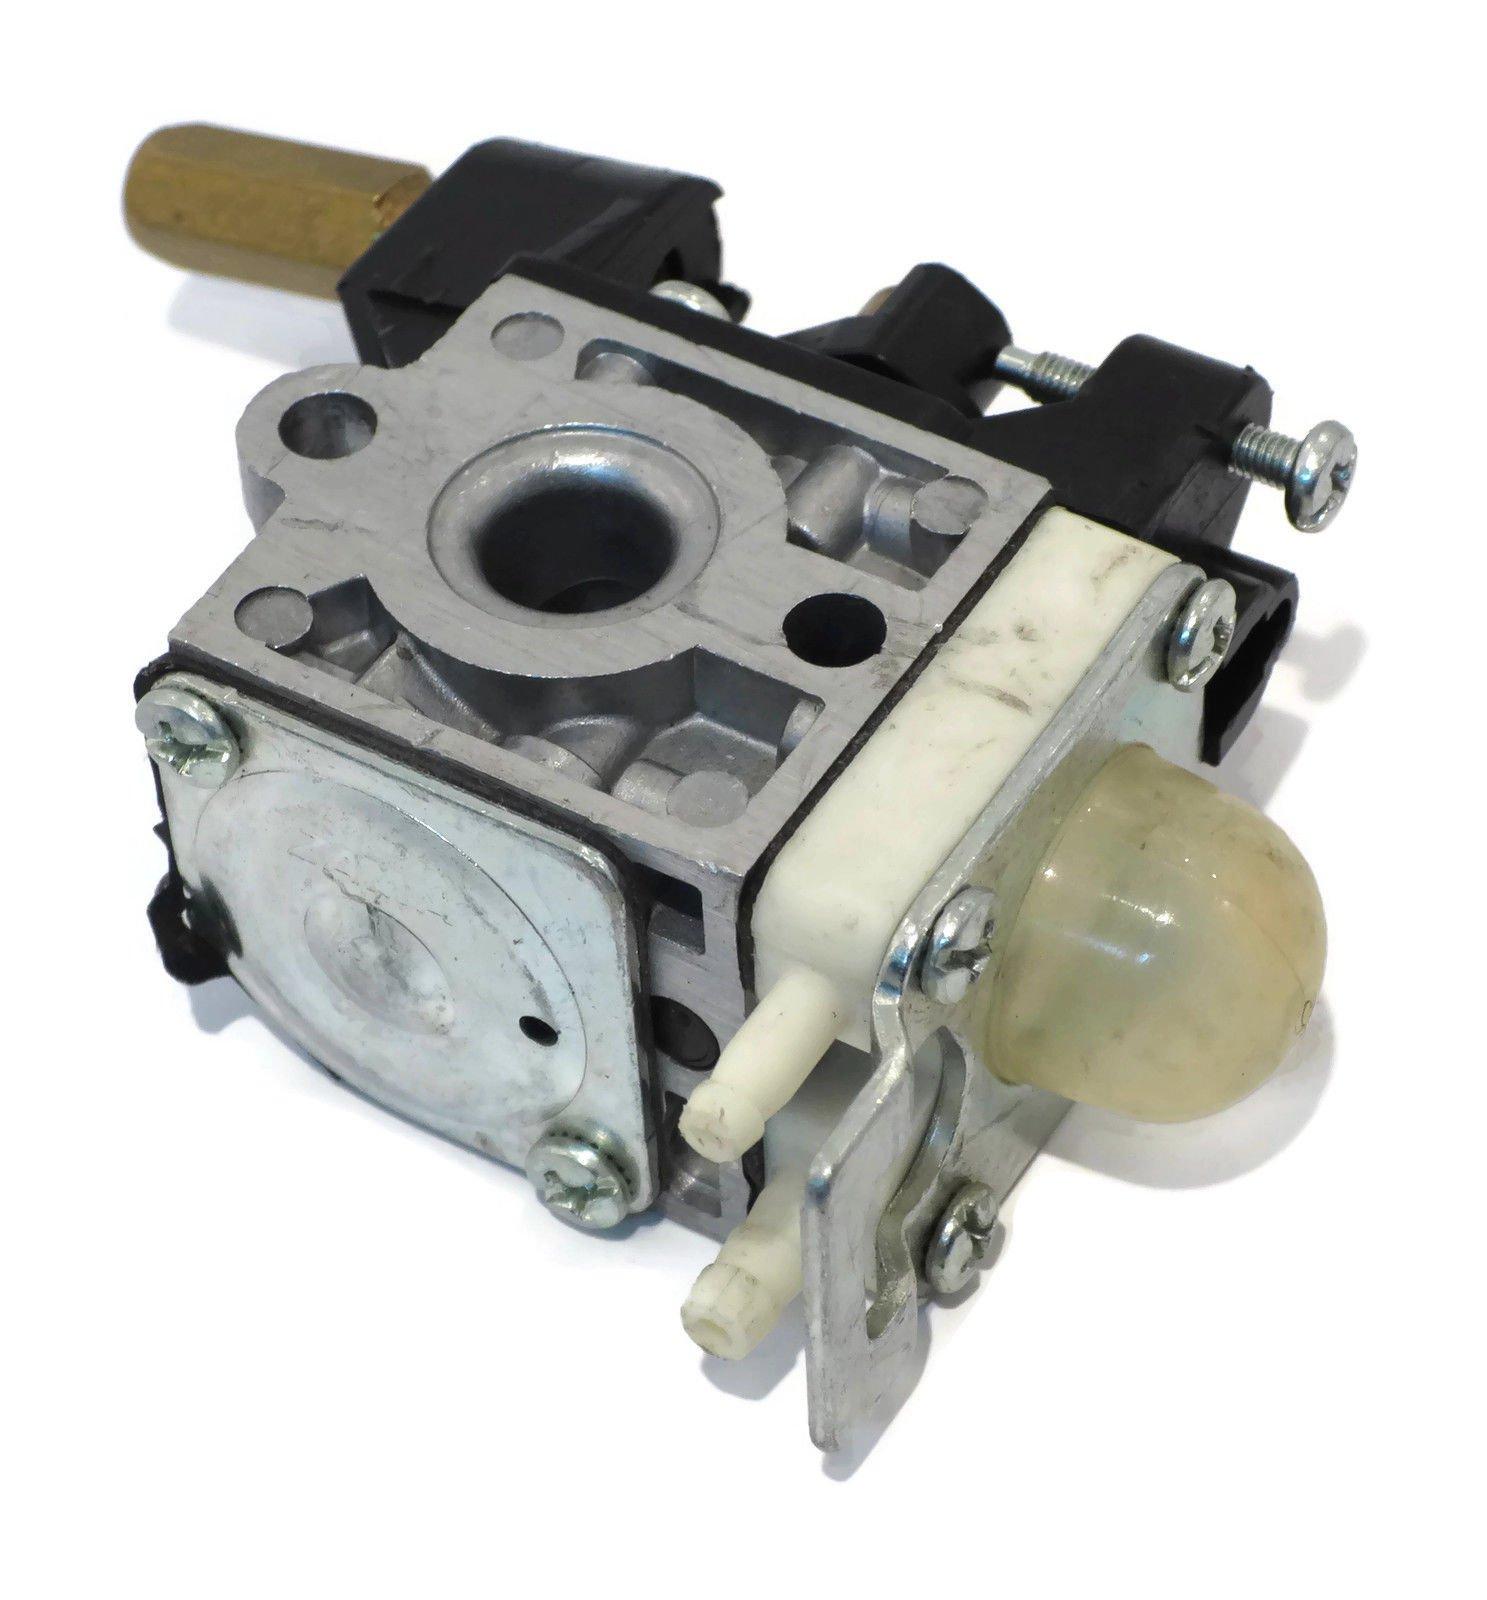 The ROP Shop CARBURETOR Carb fits Echo PPF210 PPF211 PPF230 PPT230 PPT231 Pole Saw Pruners